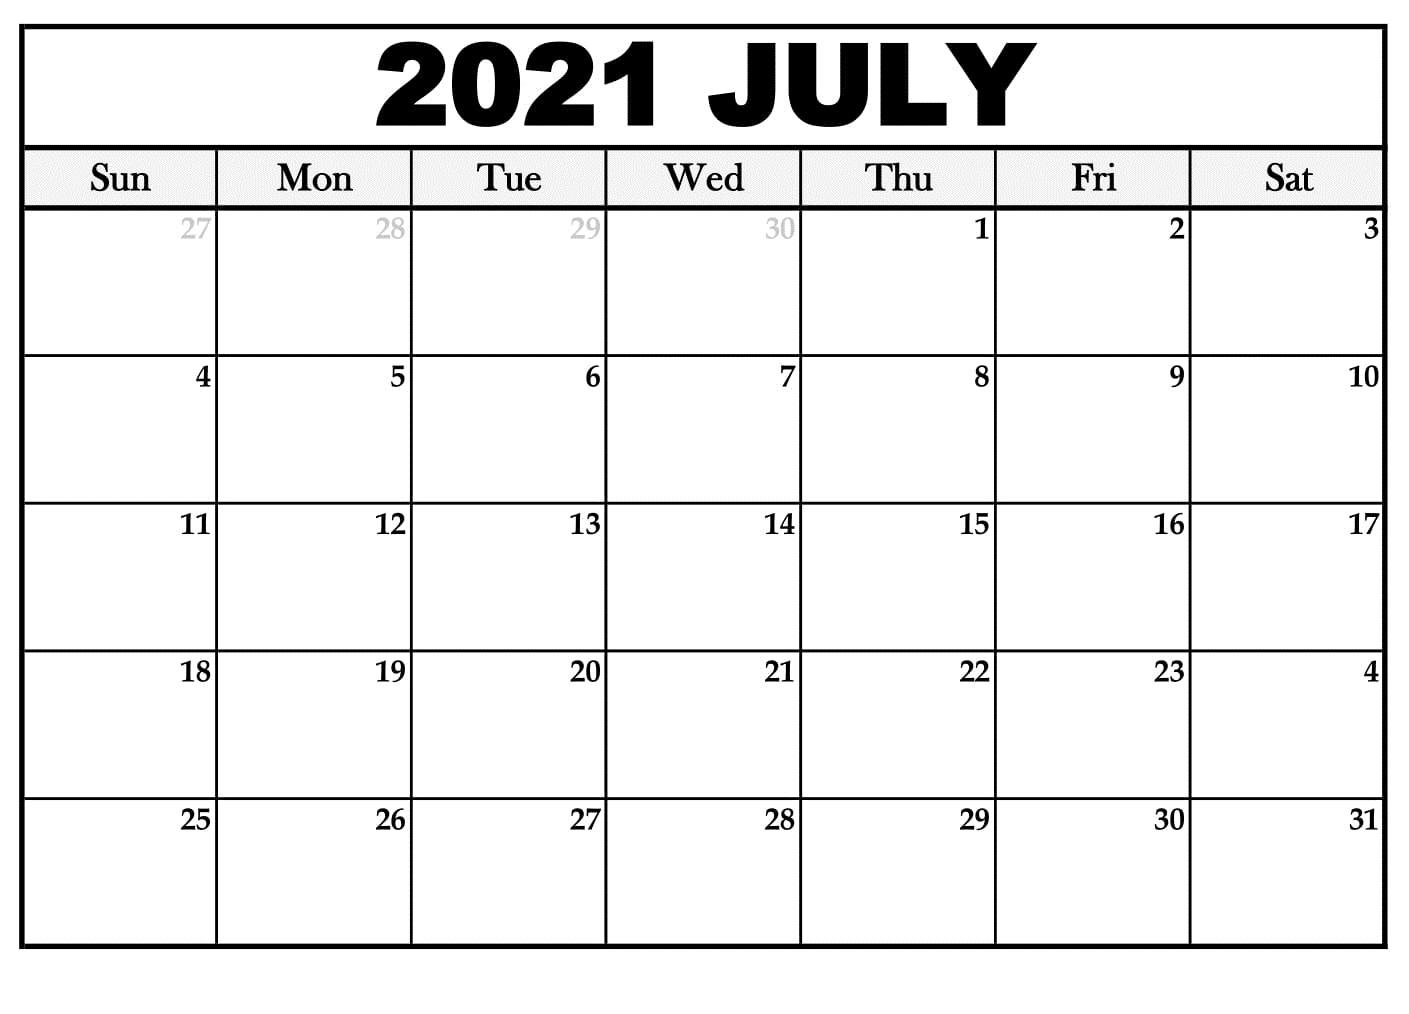 July 2021 Calendar Editable